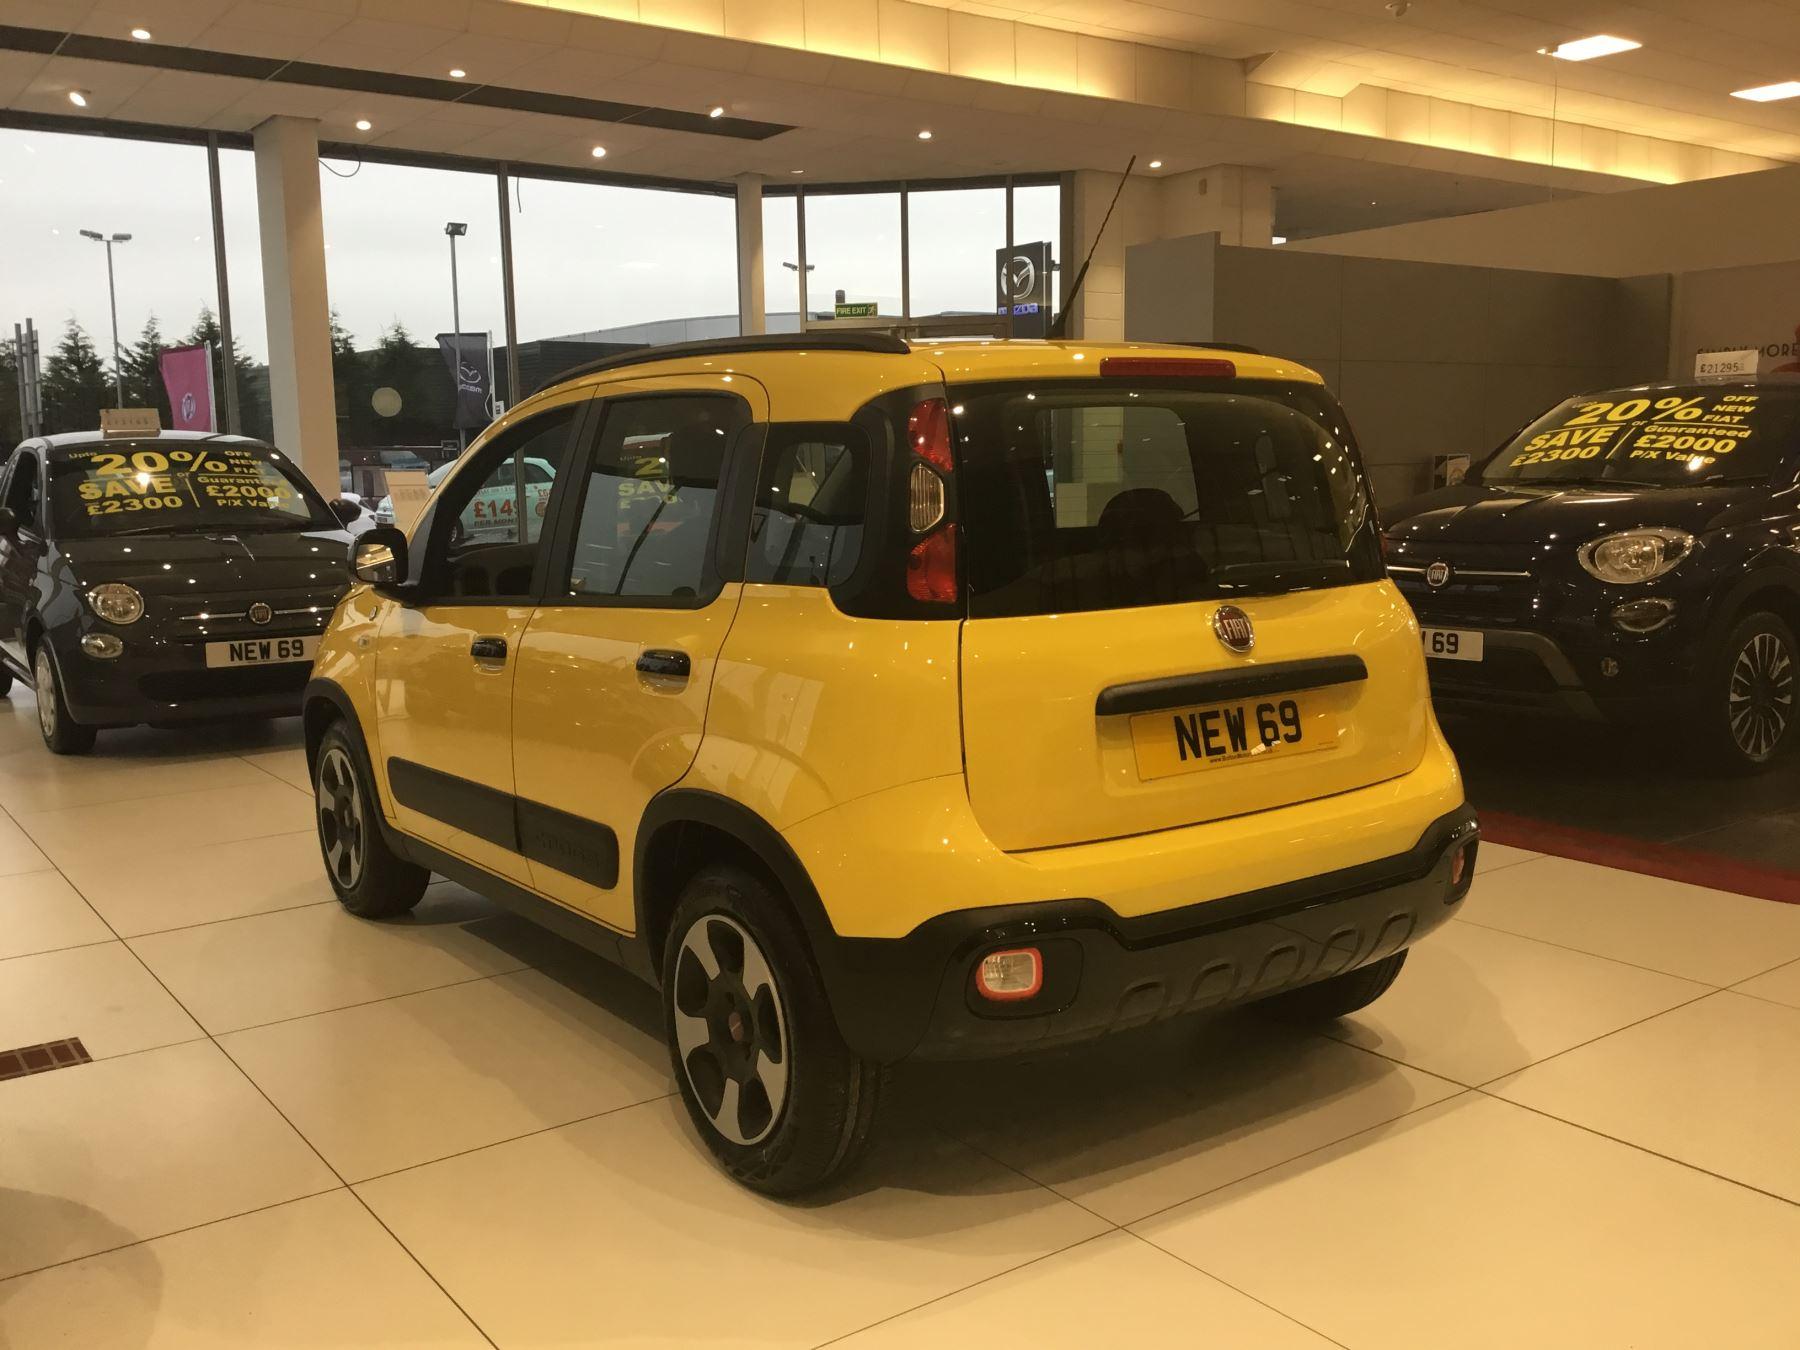 Fiat Panda 1.2 Waze SPECIAL EDITIONS image 5